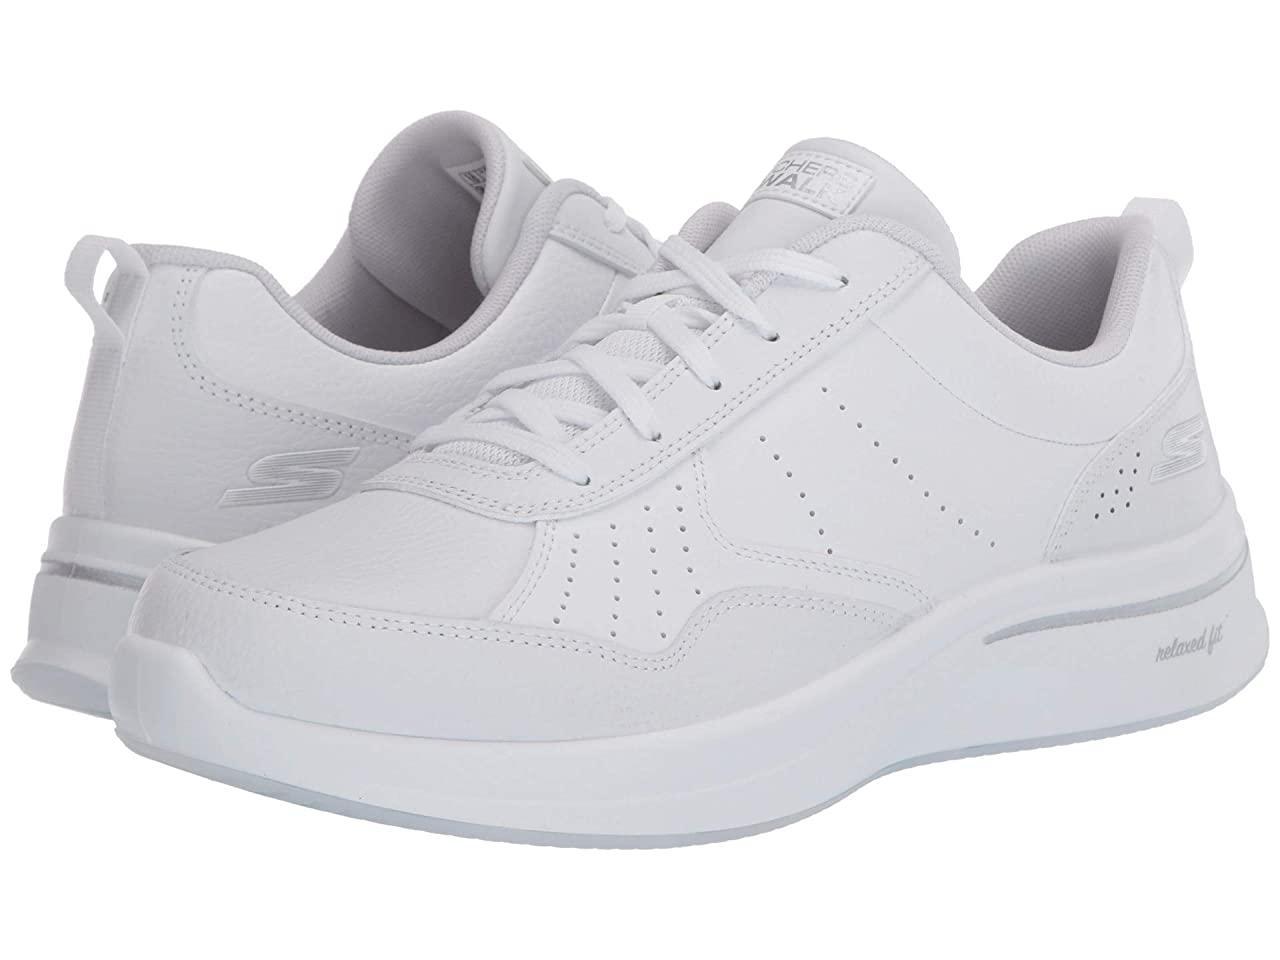 Кроссовки/Кеды SKECHERS Performance Go Walk Steady - Pro White